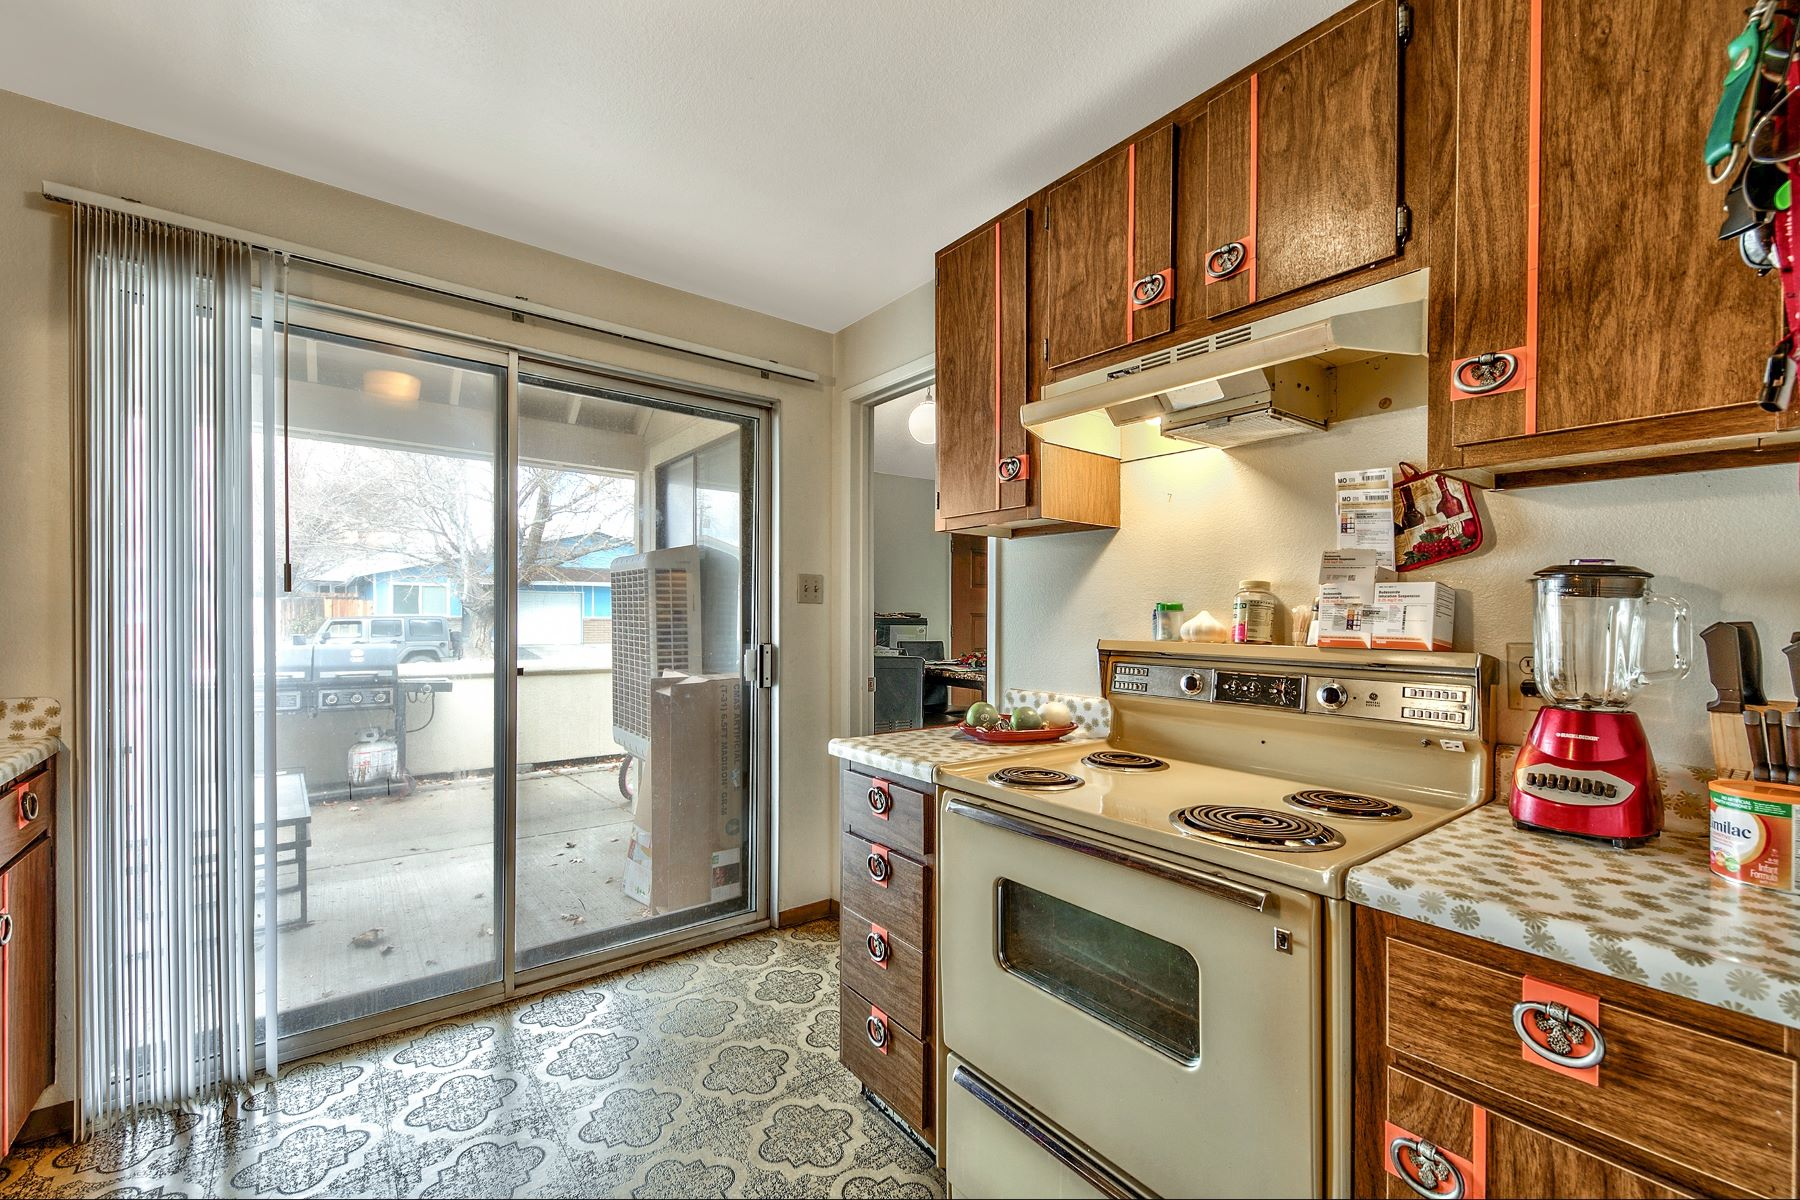 Additional photo for property listing at 1721 York Way, Sparks, NV 89431 1721 York Way 斯帕克斯, 内华达州 89431 美国